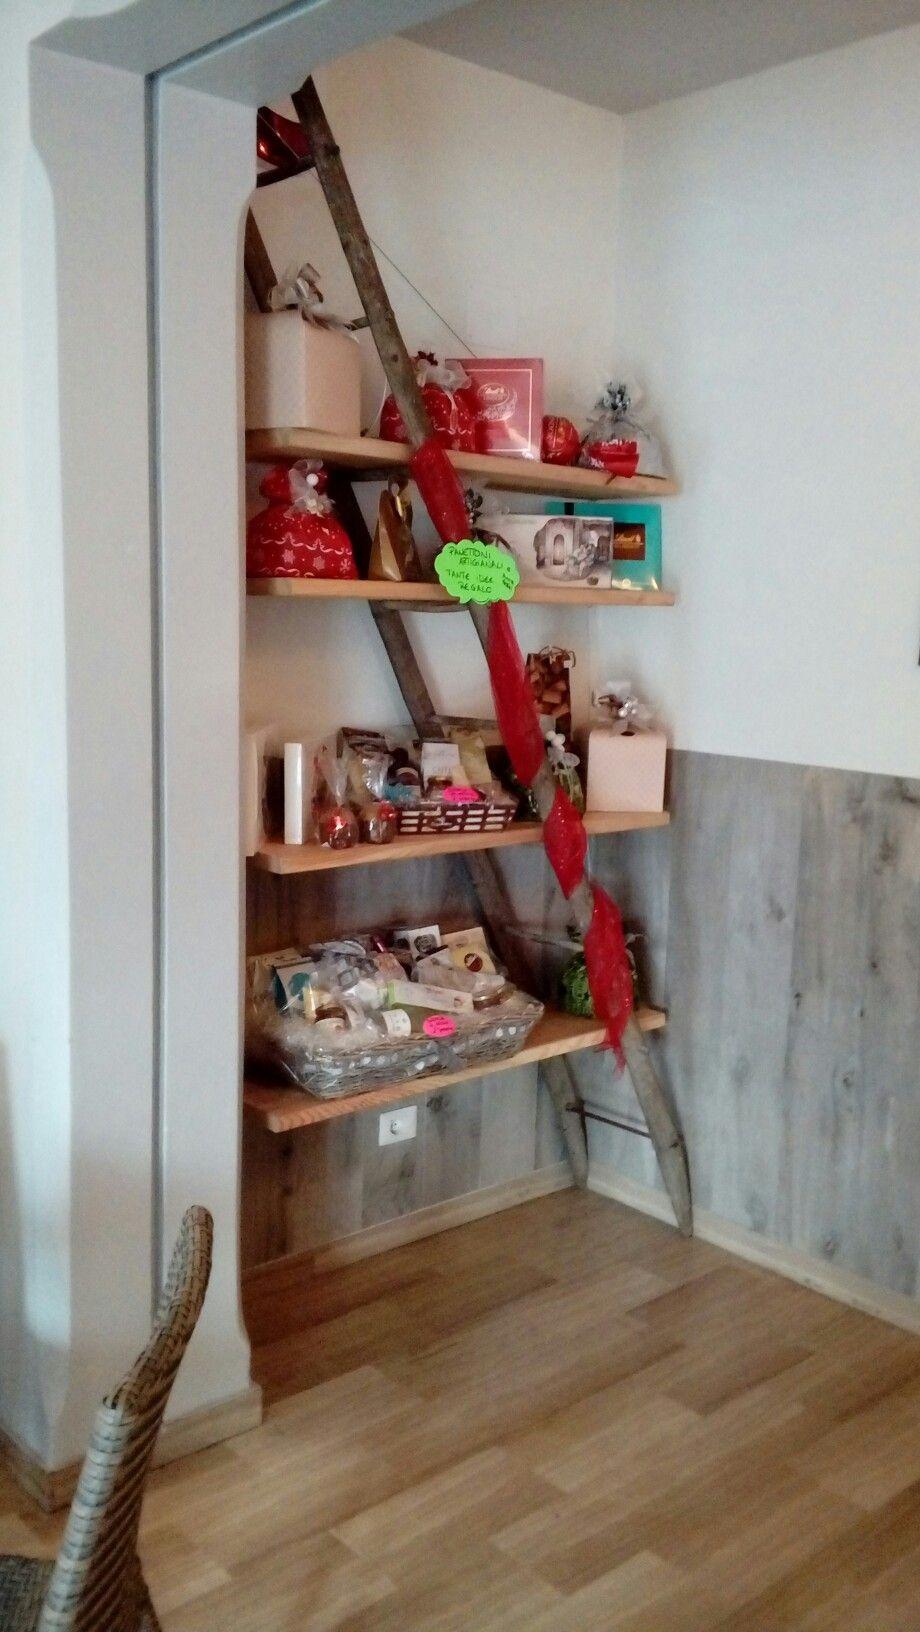 Mensole scala vecchia shelves old scale